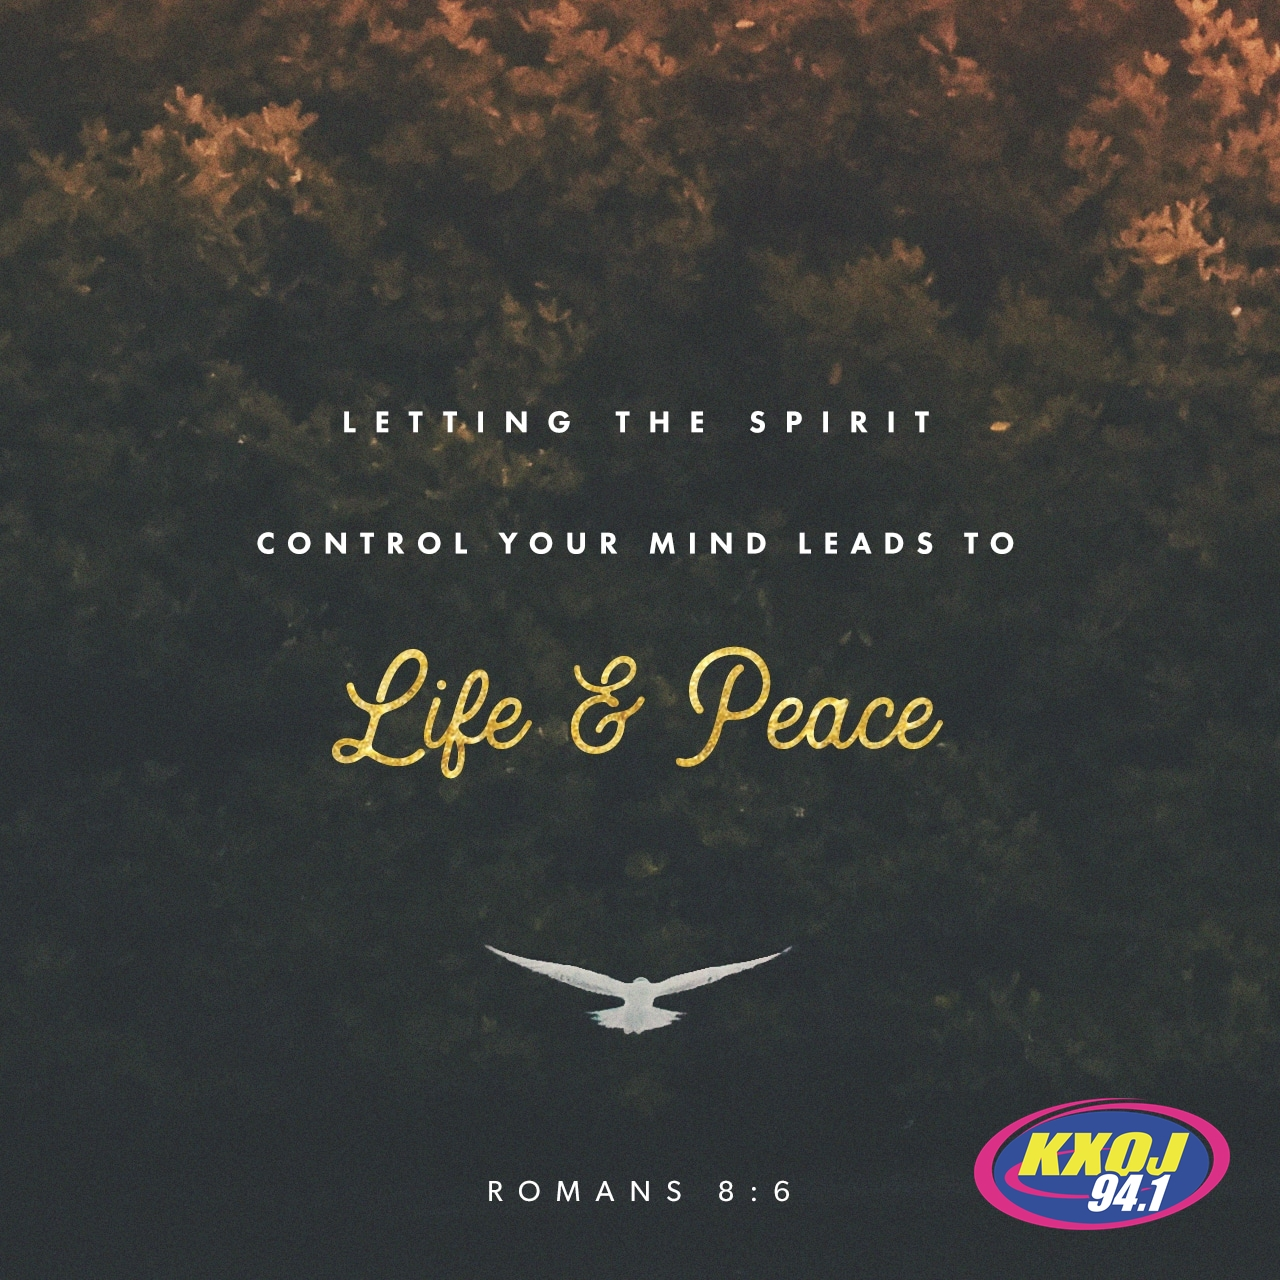 May 23rd - Romans 8:6